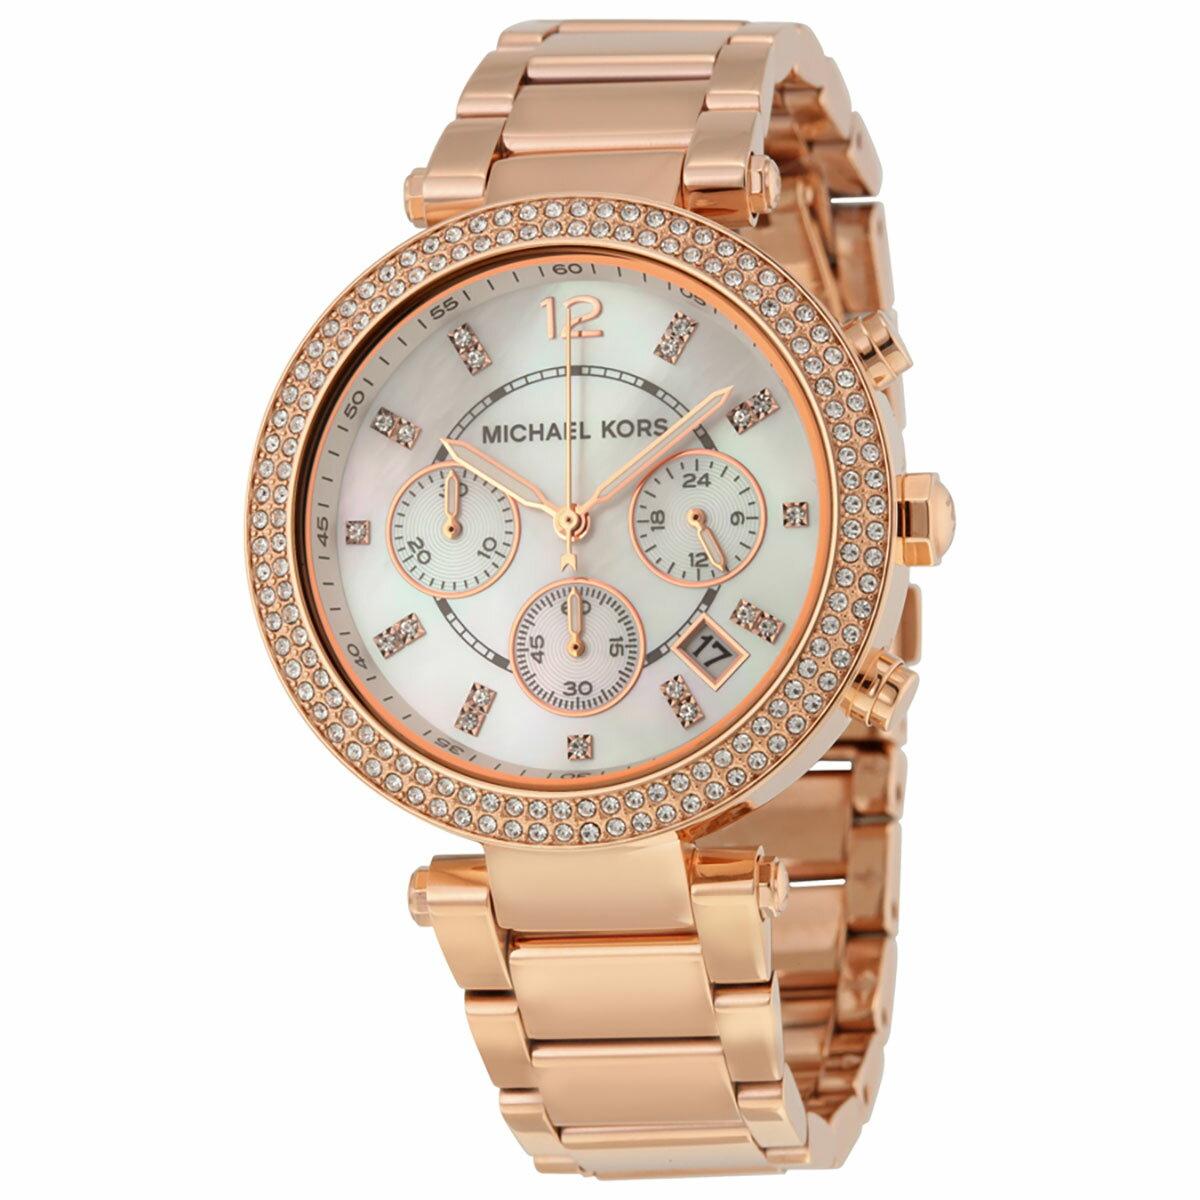 Outlet 正品代購 MichaelKors MK 玫瑰金鑲鑽 三環計時手錶腕錶 MK5491